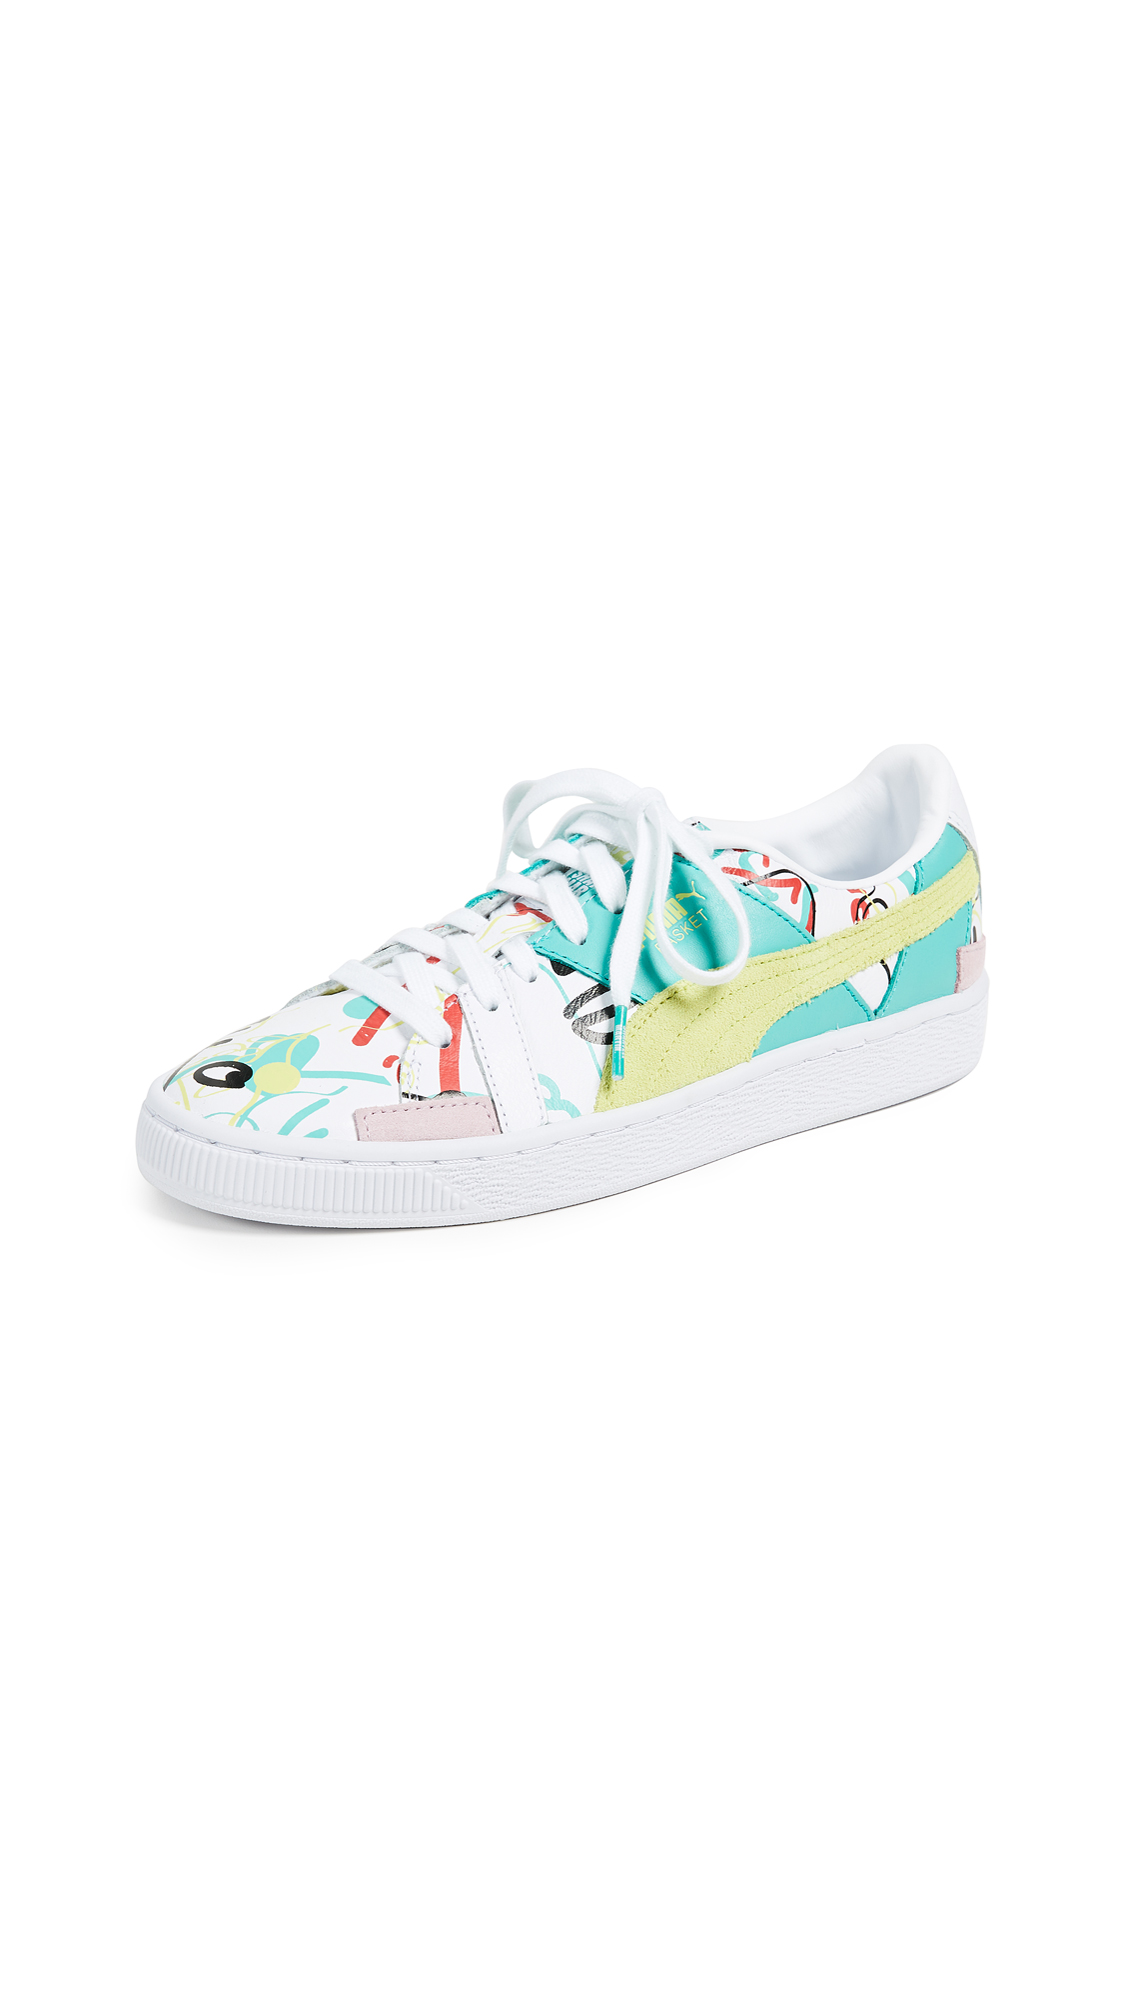 PUMA Basket Graphic SM Sneakers - Puma White/Sunny Lime